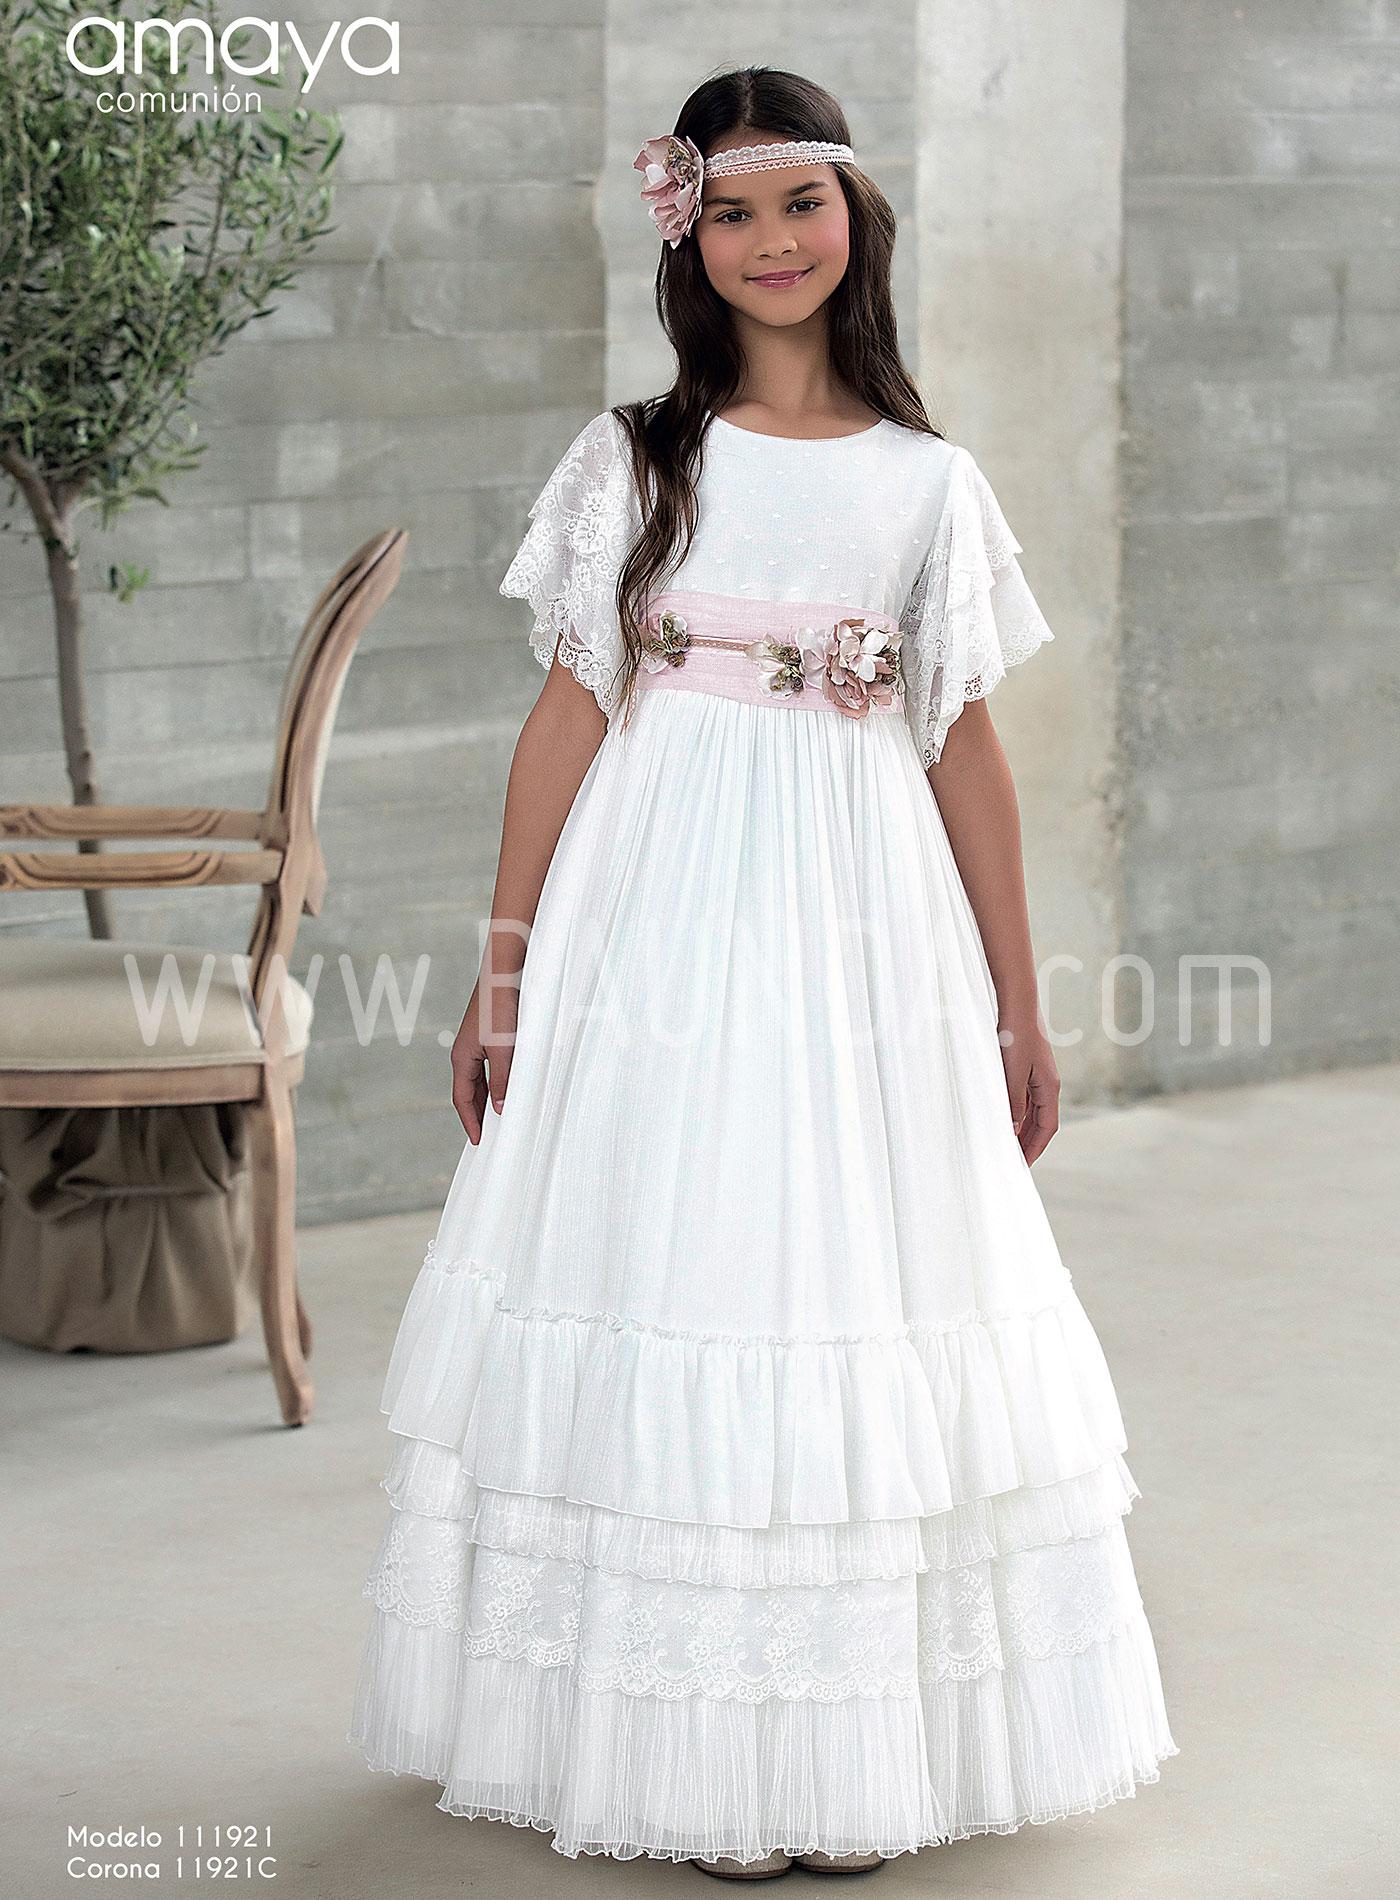 precio justo gran inventario comprar baratas Baunda OUTLET vestidos comunión de niña - Baunda